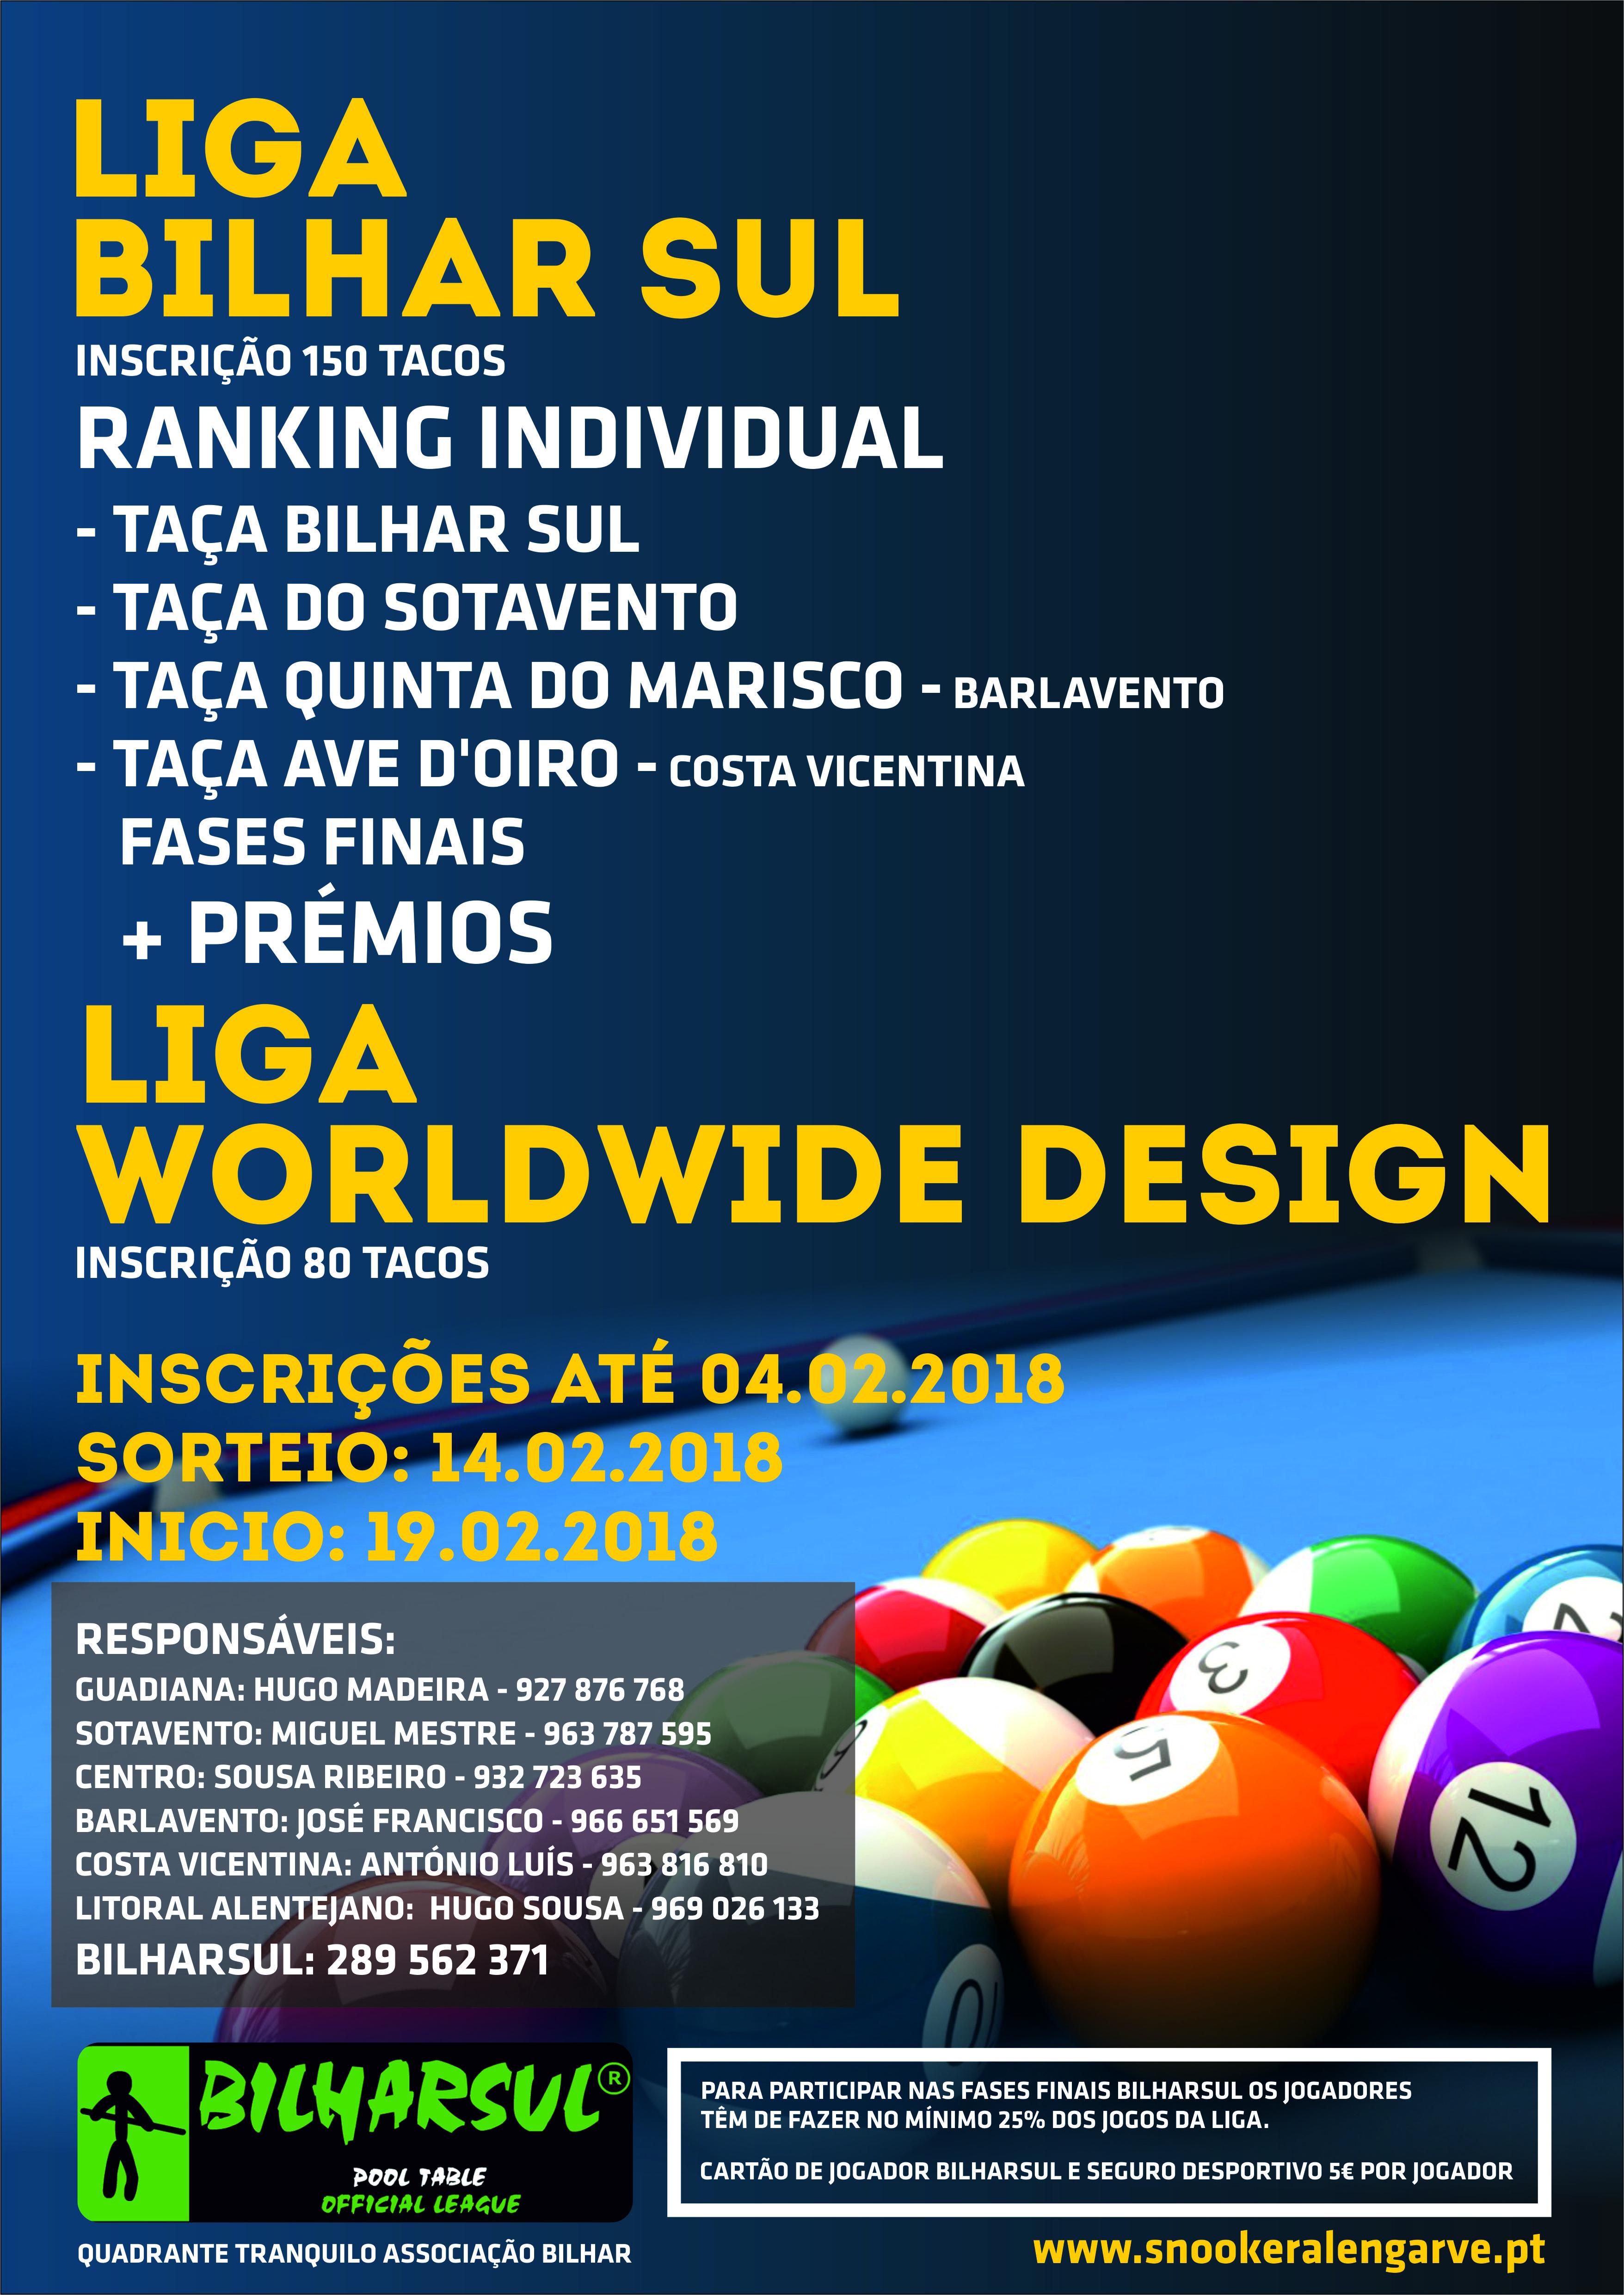 Liga Bilhar Sul / Liga WorldWide Design